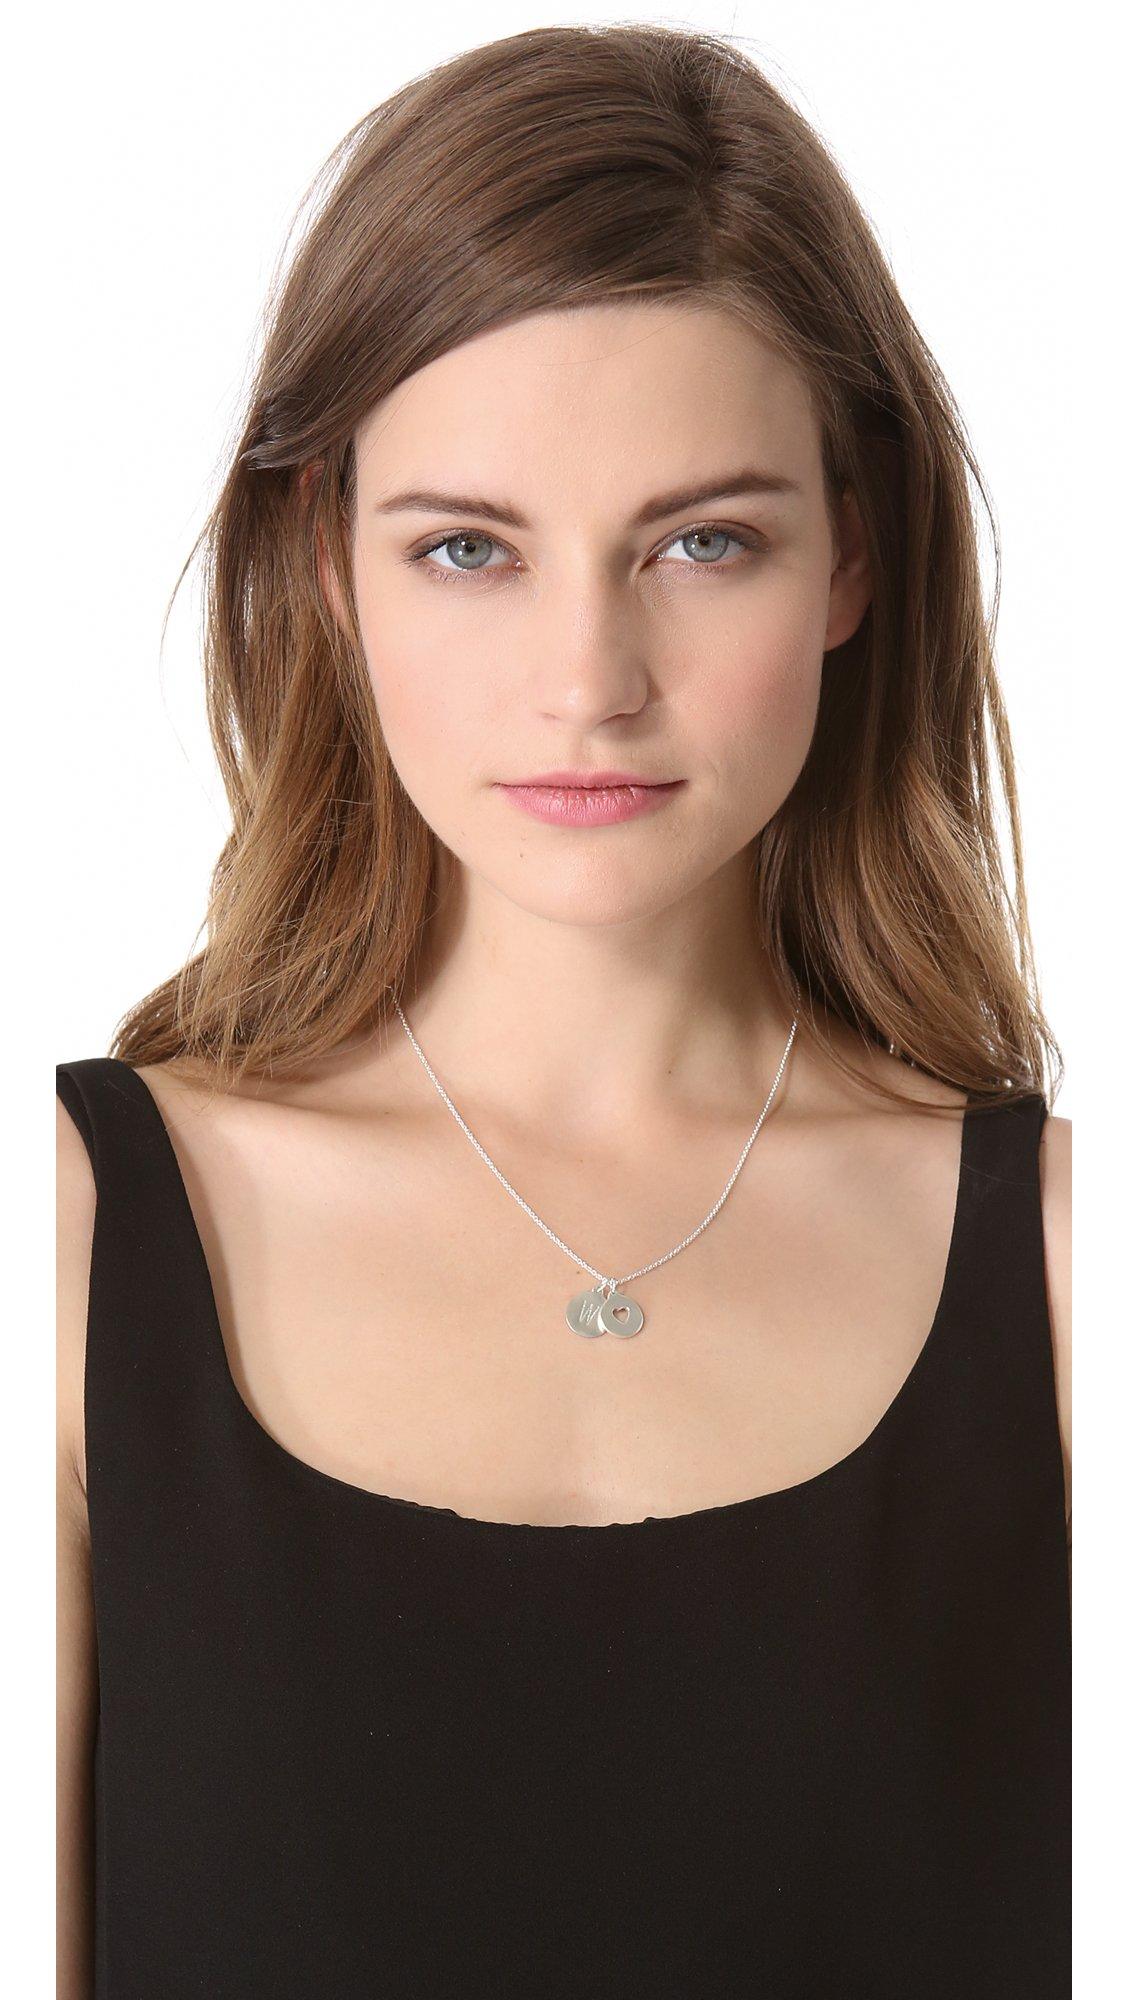 Helen Ficalora Cutout Heart Charm - Silver in Metallic